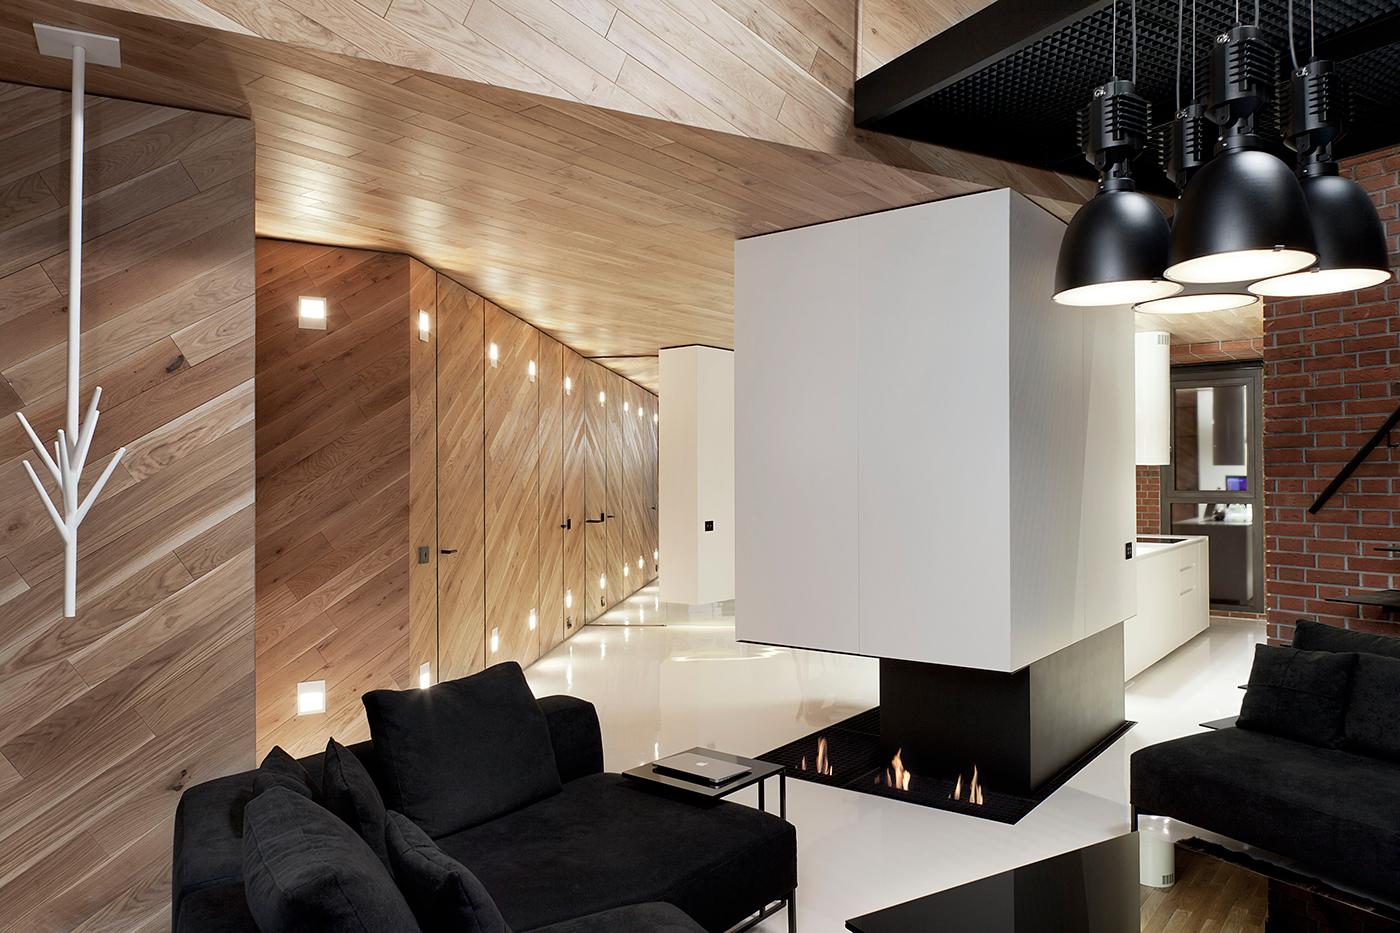 studio mode9 Loft Apartment By Studio Mode